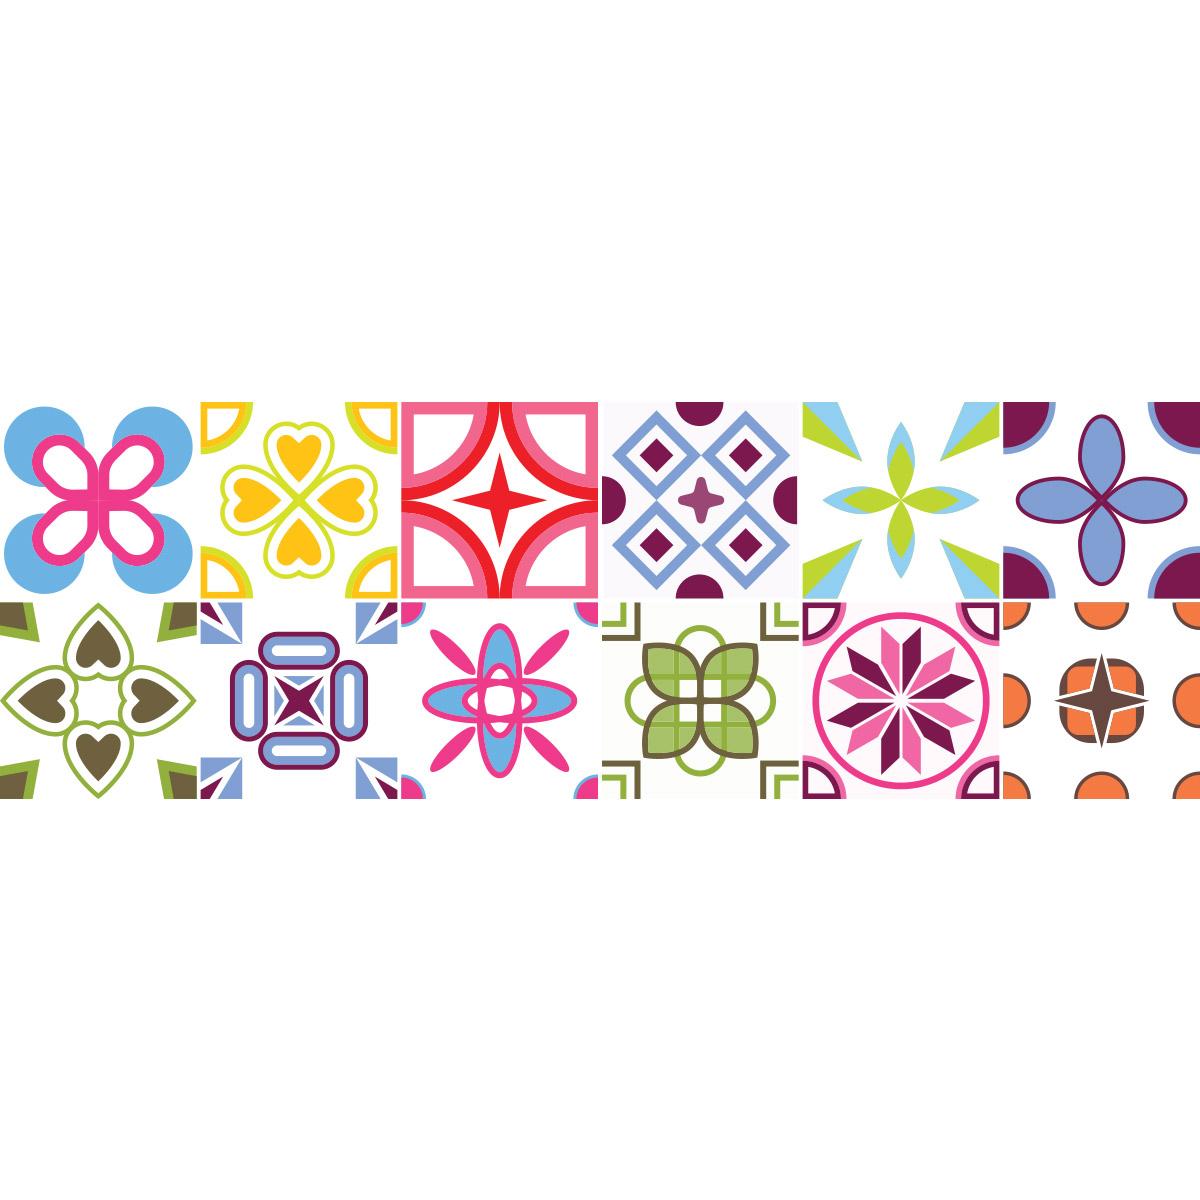 Stickers speciaux - 12 Stickers carrelages arabesques